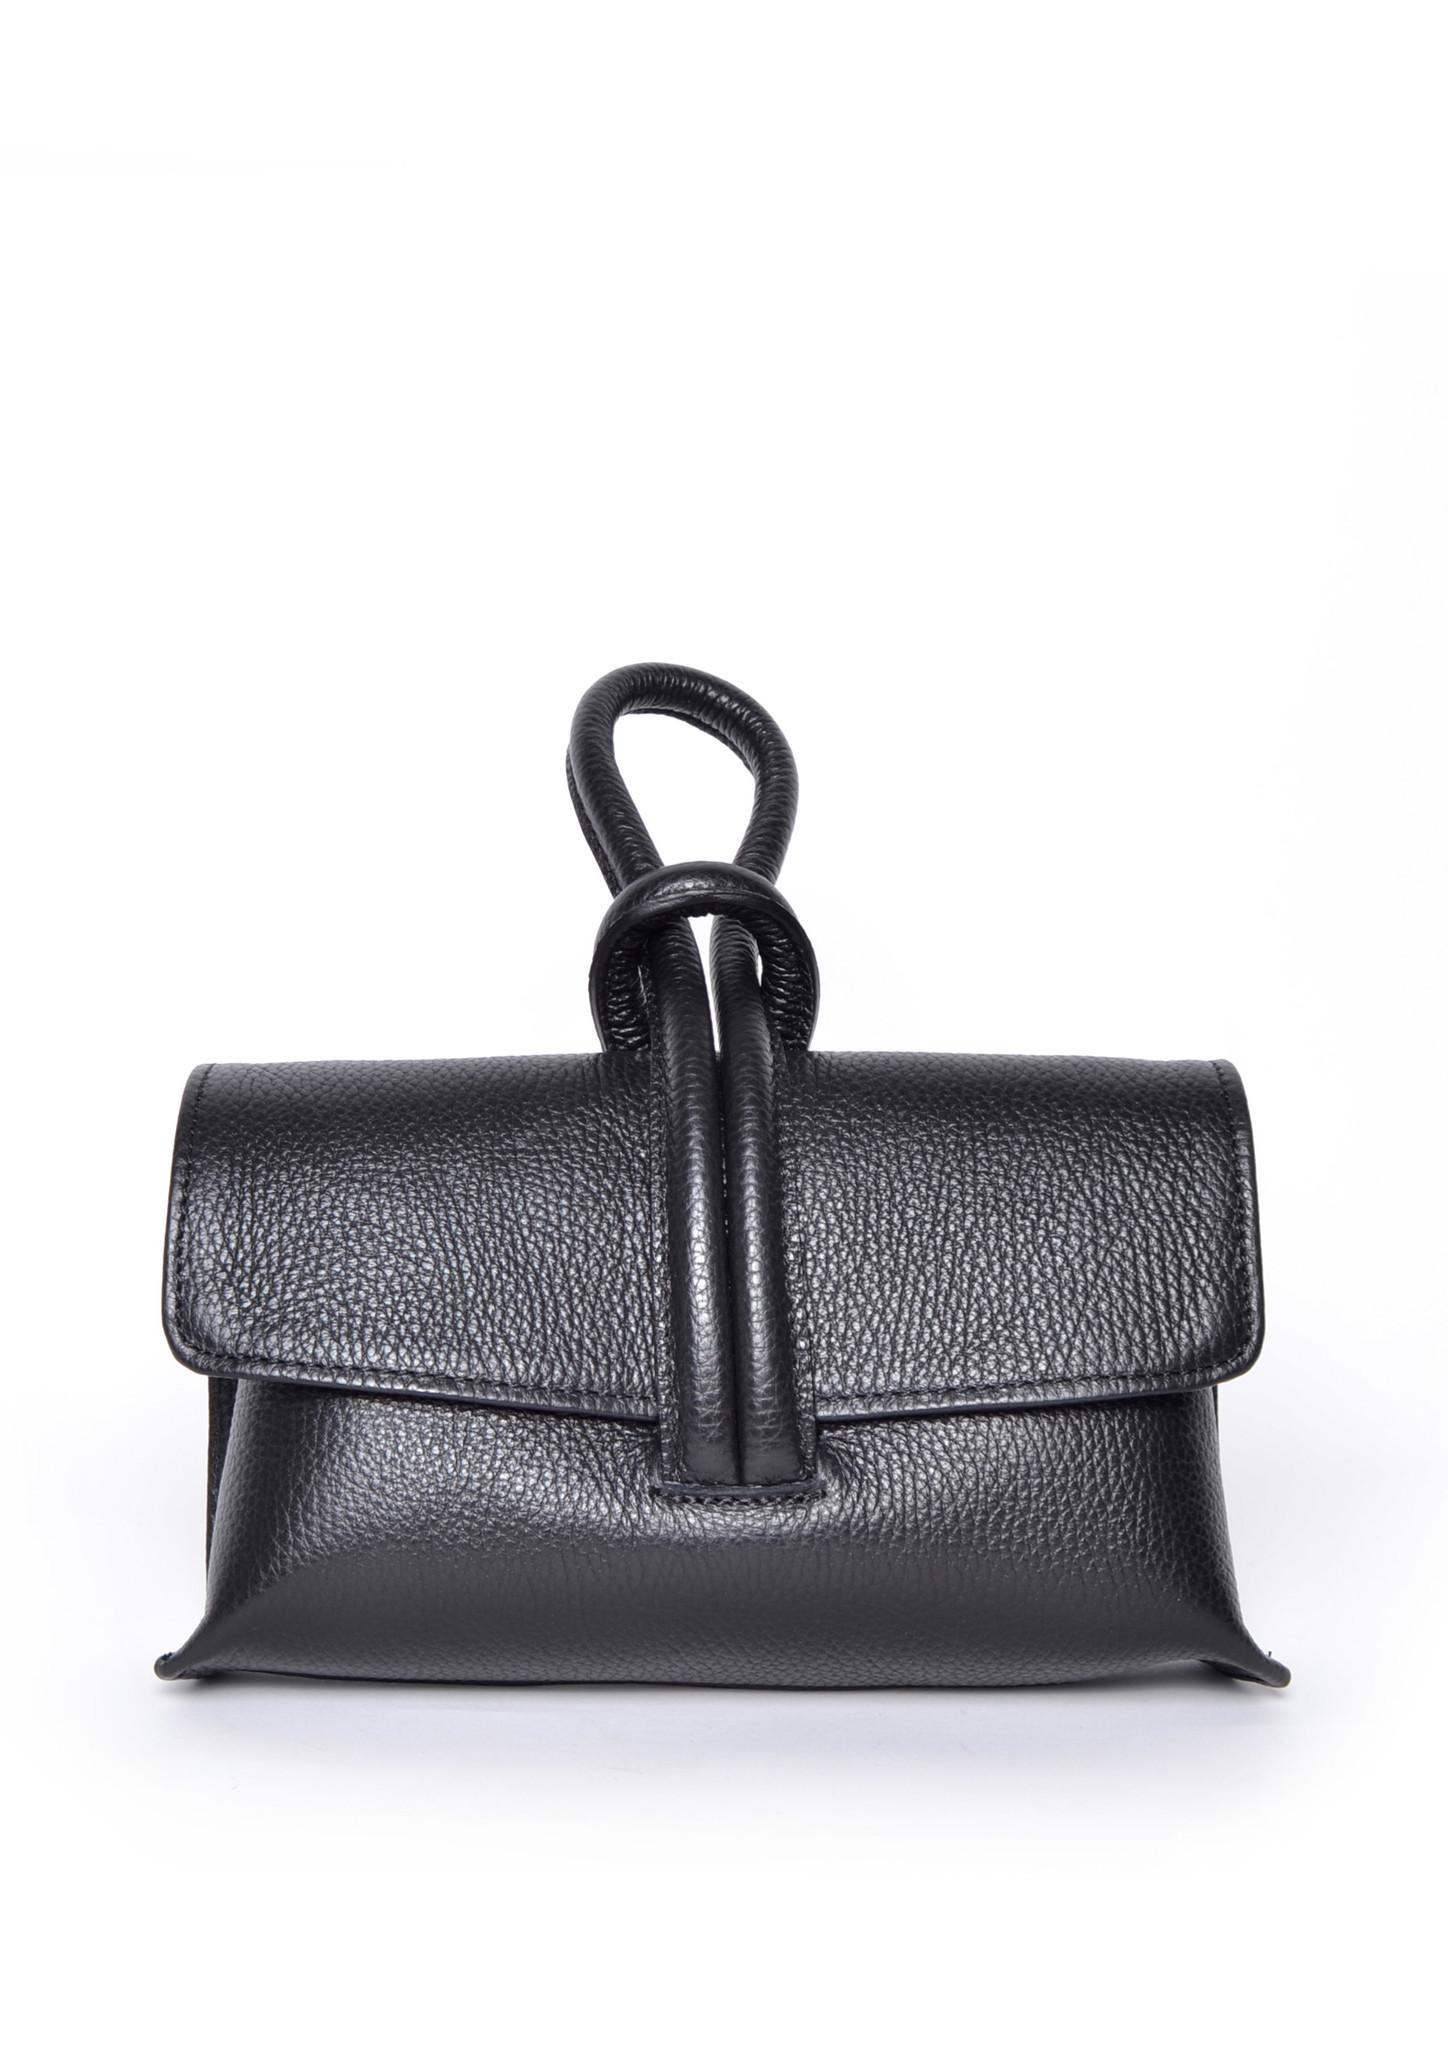 Leren Schoudertas Sandy zwart zwarte schoudertassen look a like tassen trendy musthave fashion tas giuliano kopen bestellen